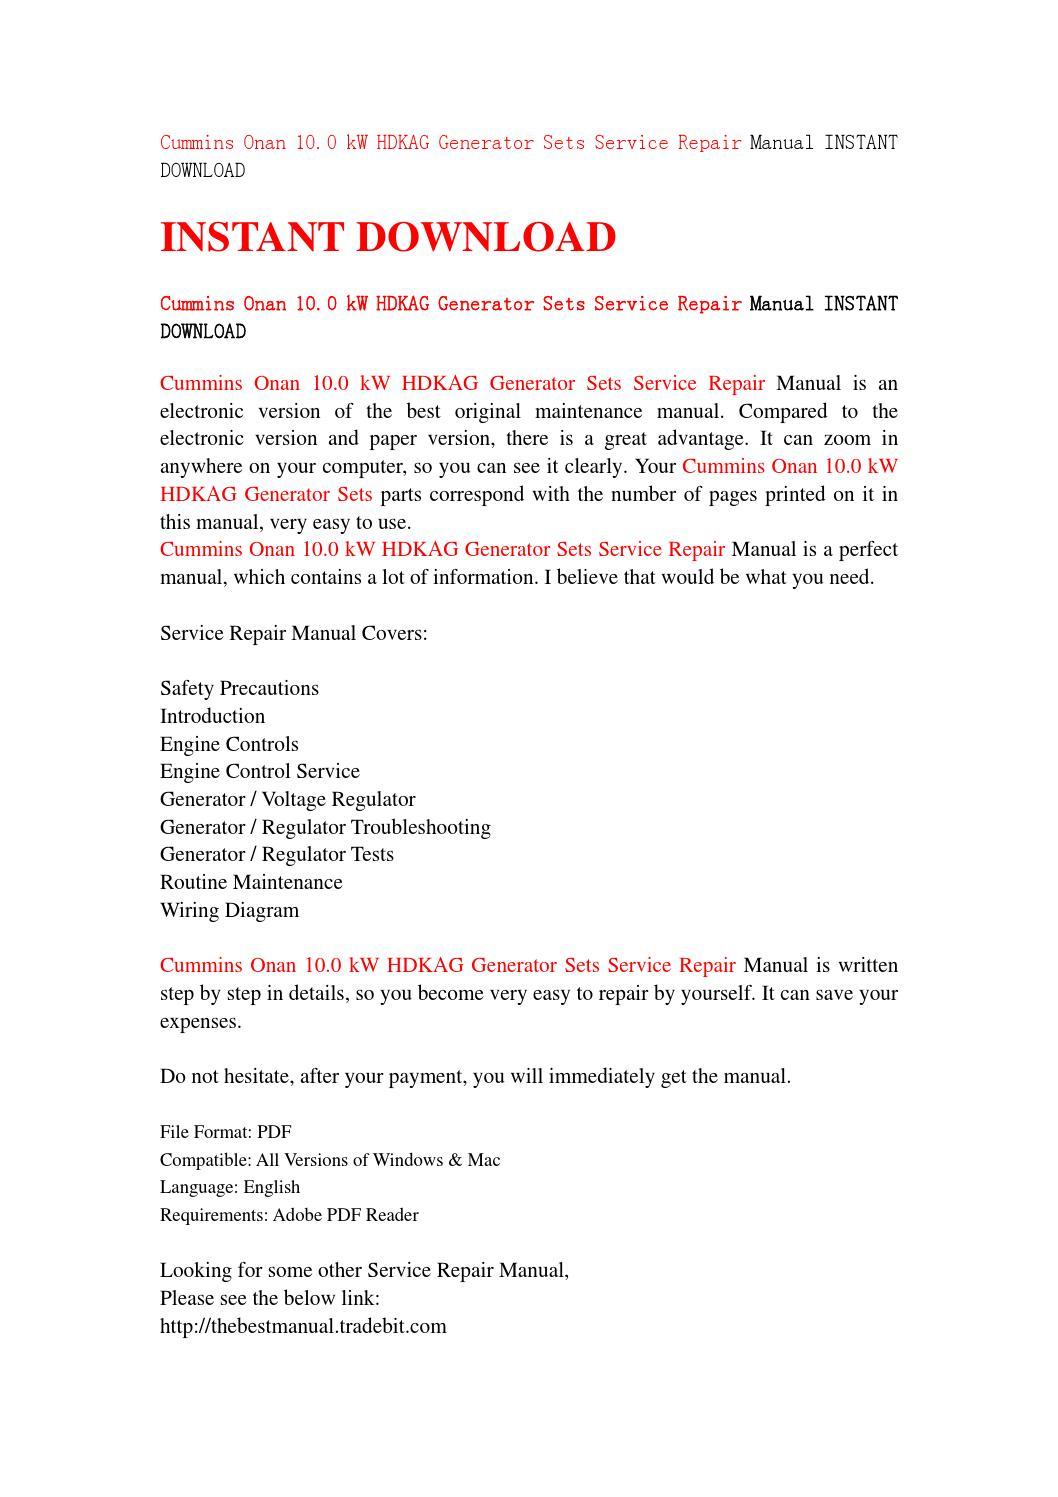 Cummins onan 10 0 kw hdkag generator sets service repair manual instant  download by kmsjhefnjn - issuu